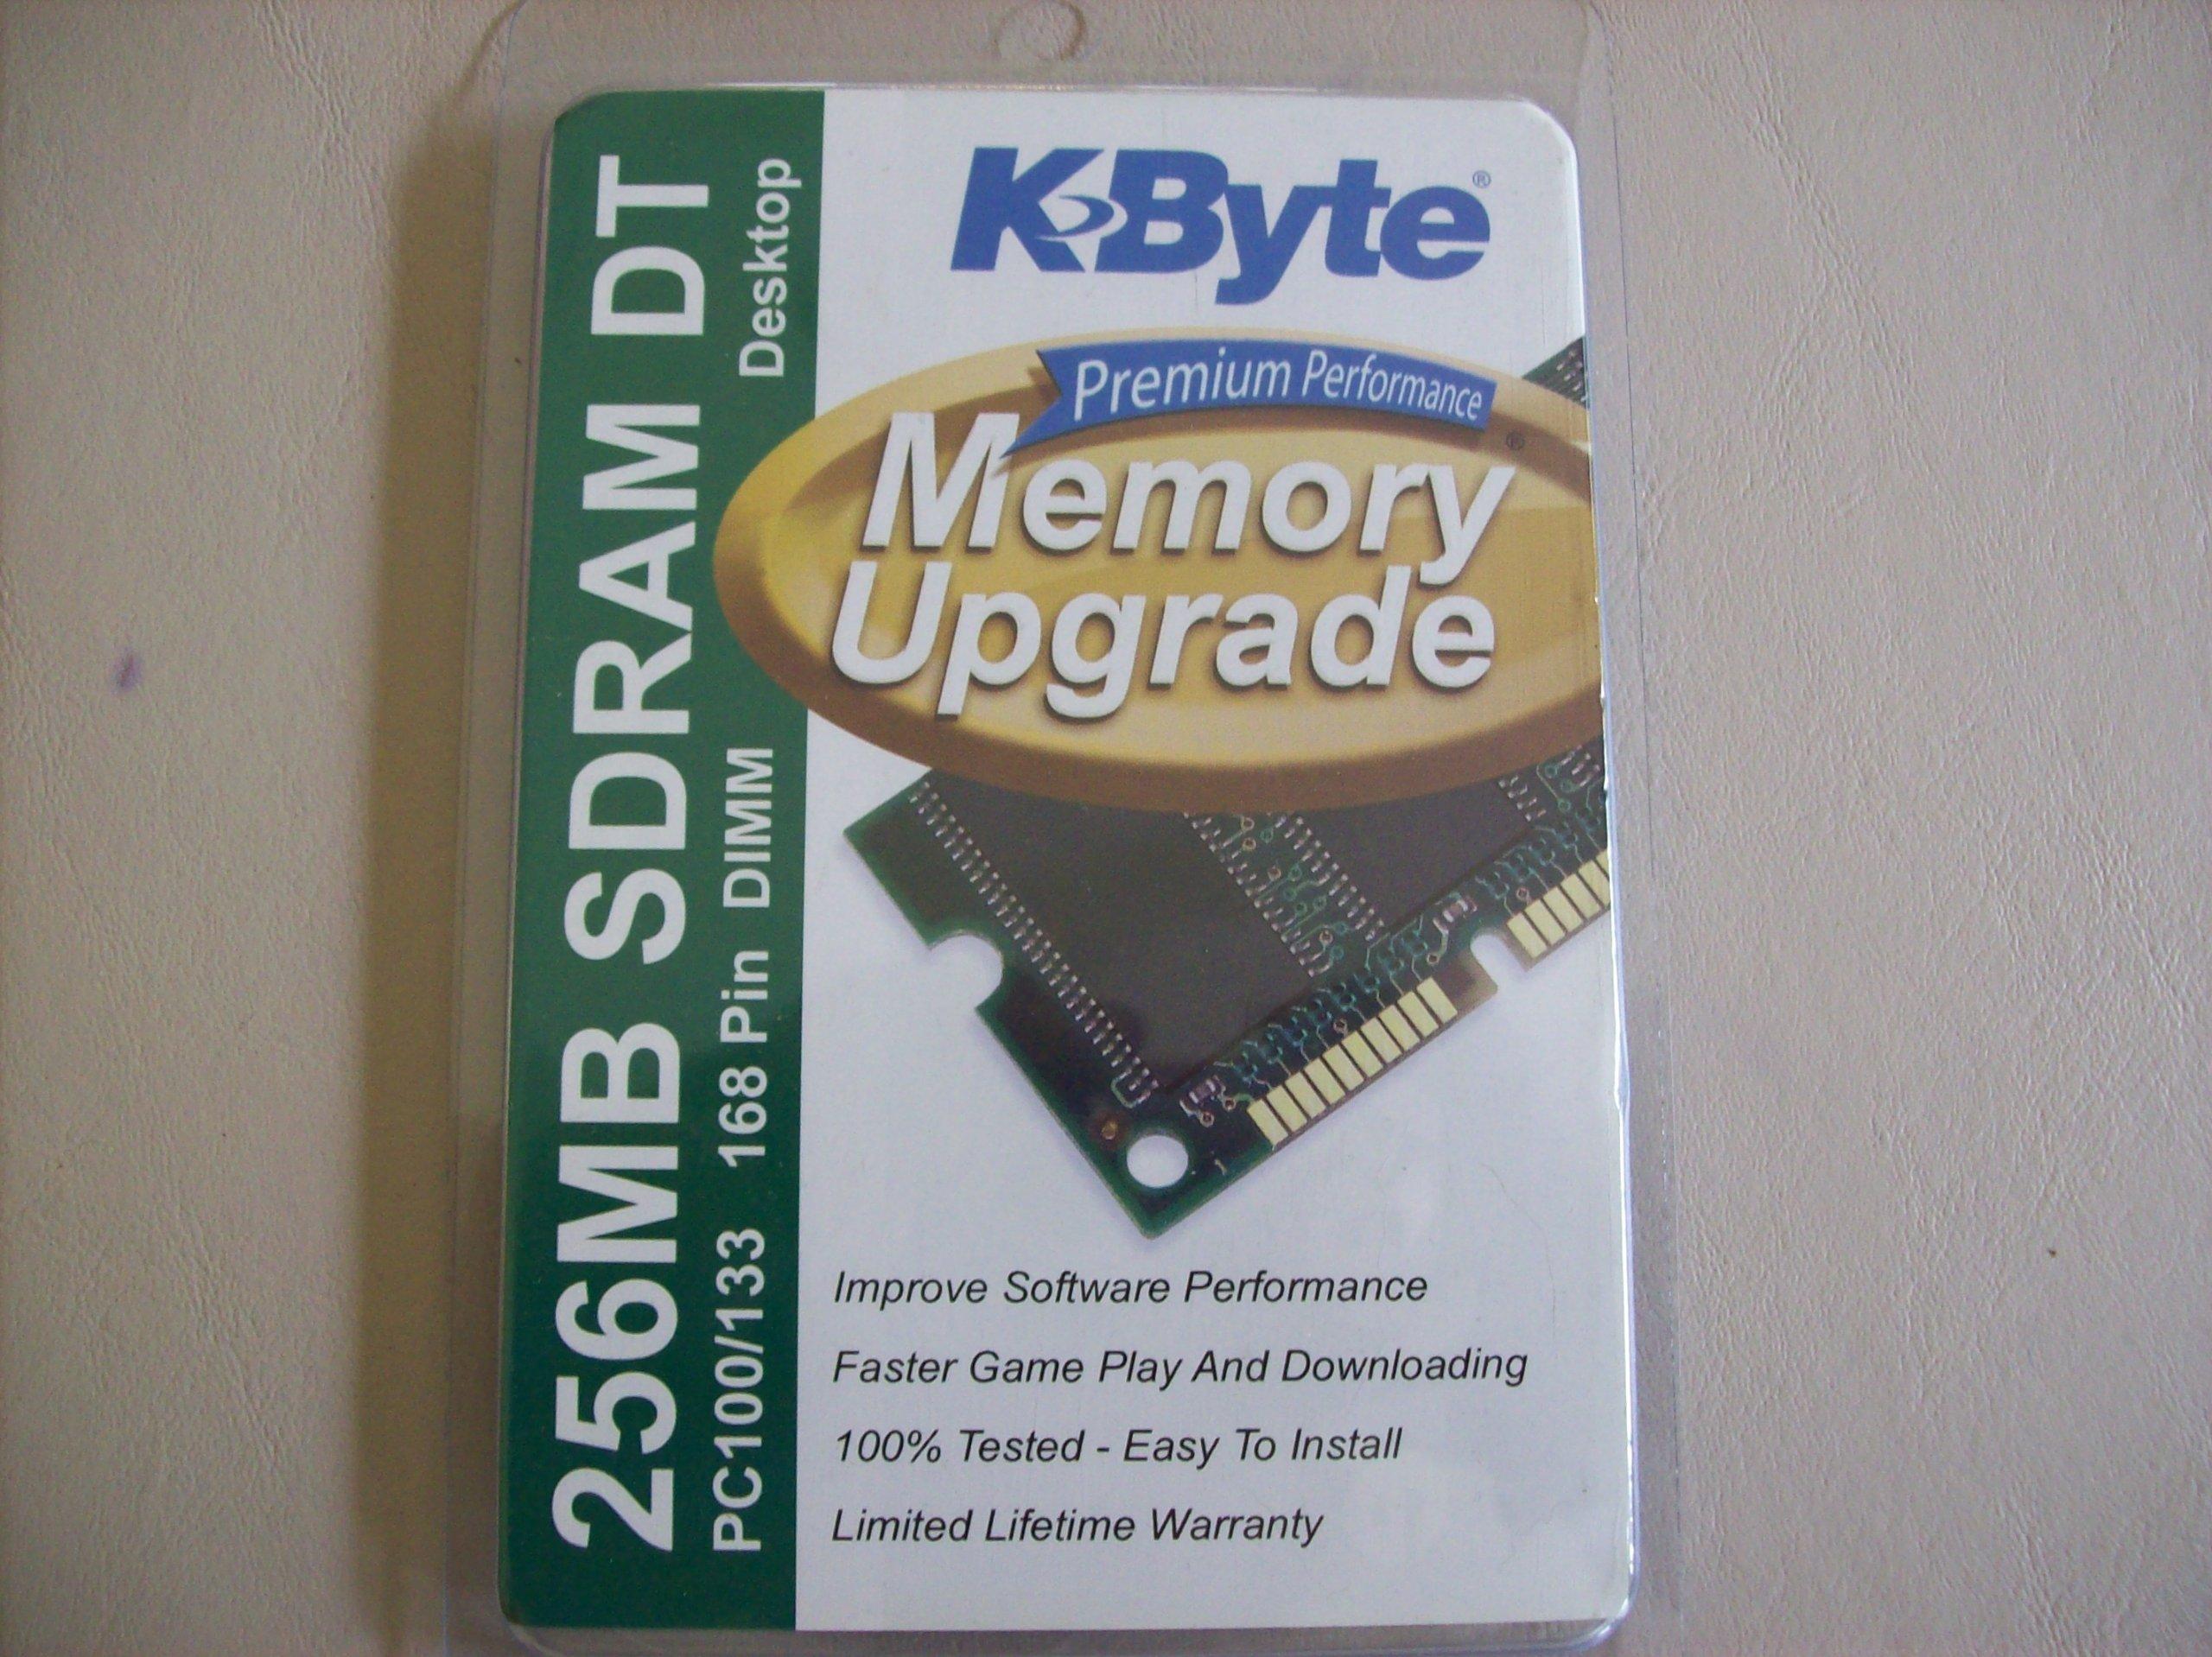 Memoria RAM 256MB KByte Premium Performance Upgrade SD Ram